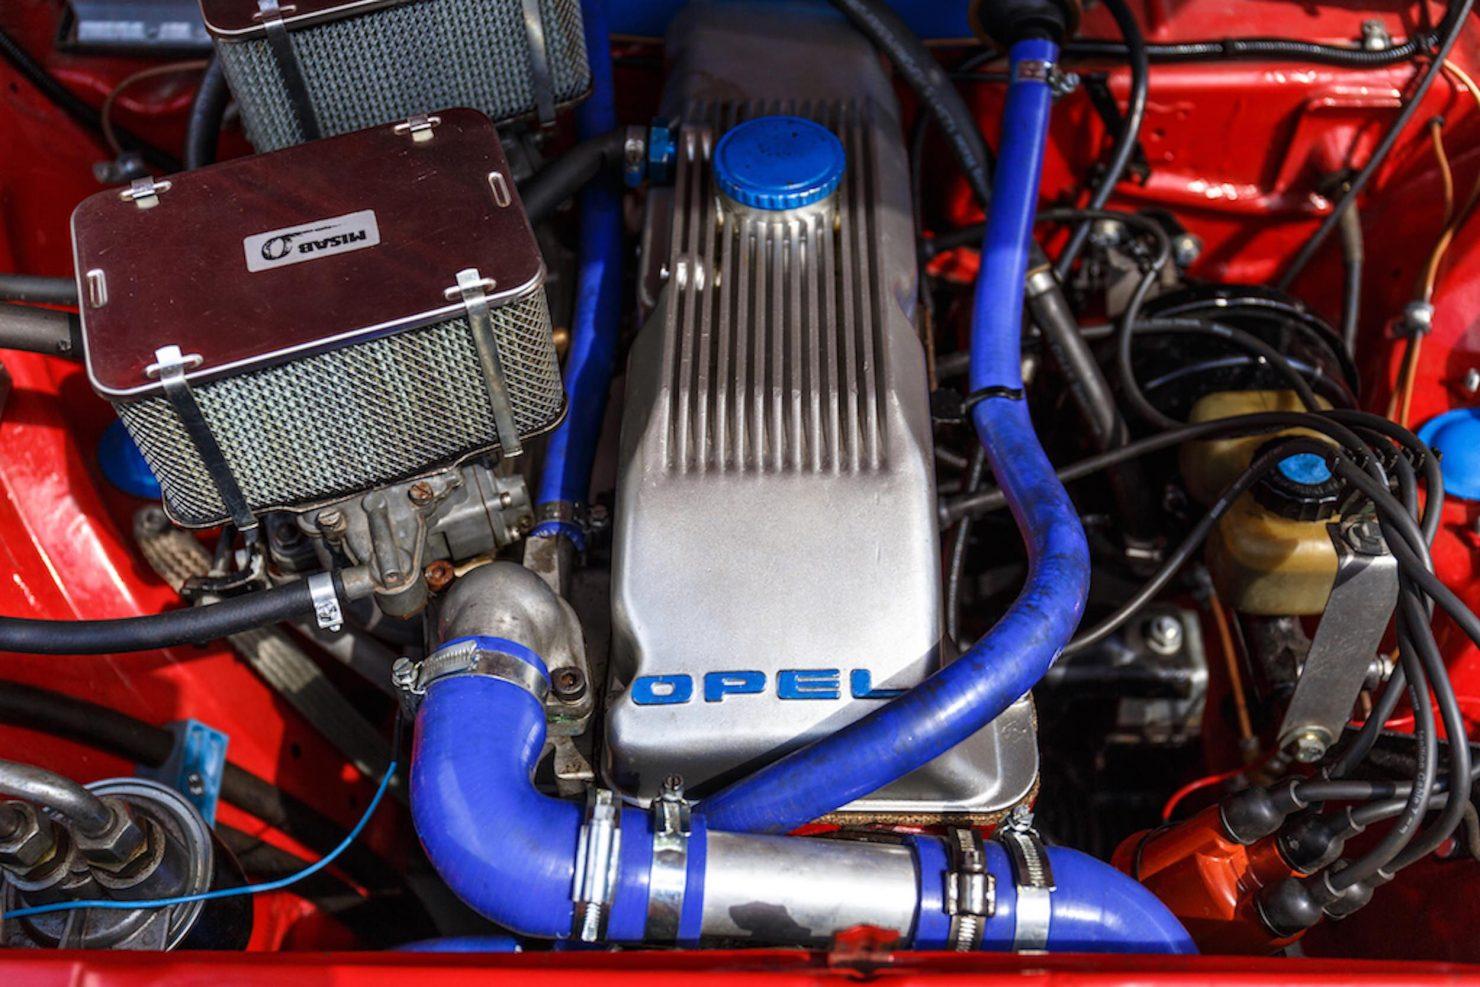 opel kadett rallye car 13 1480x987 - 1969 Opel Rallye Kadett